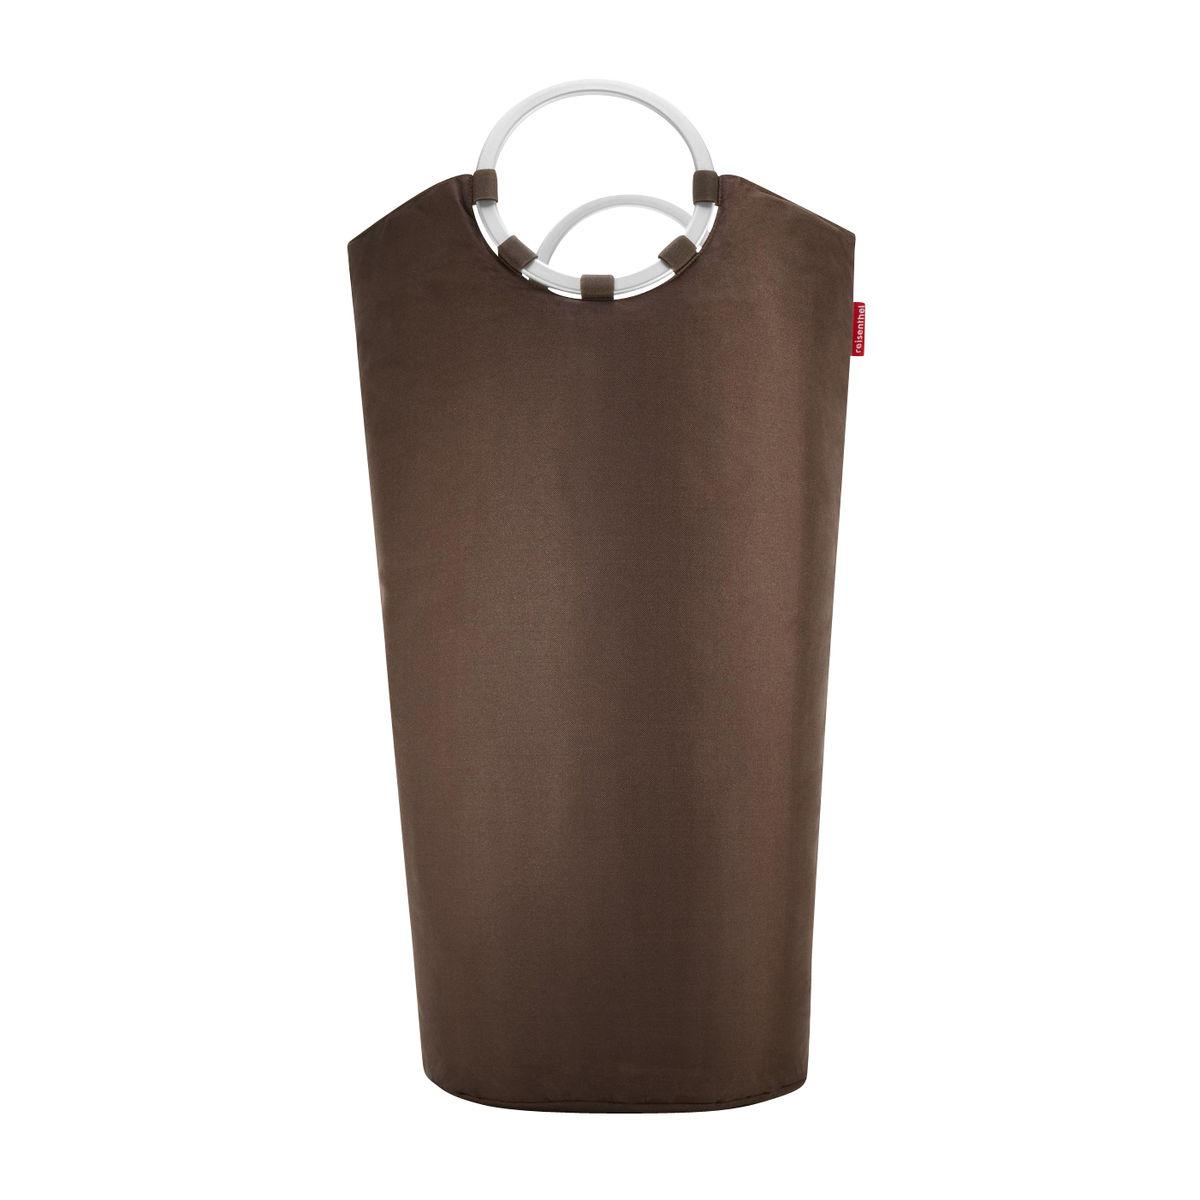 reisenthel looplaundry panier linge reisenthel paniers linge rangement accessoires. Black Bedroom Furniture Sets. Home Design Ideas